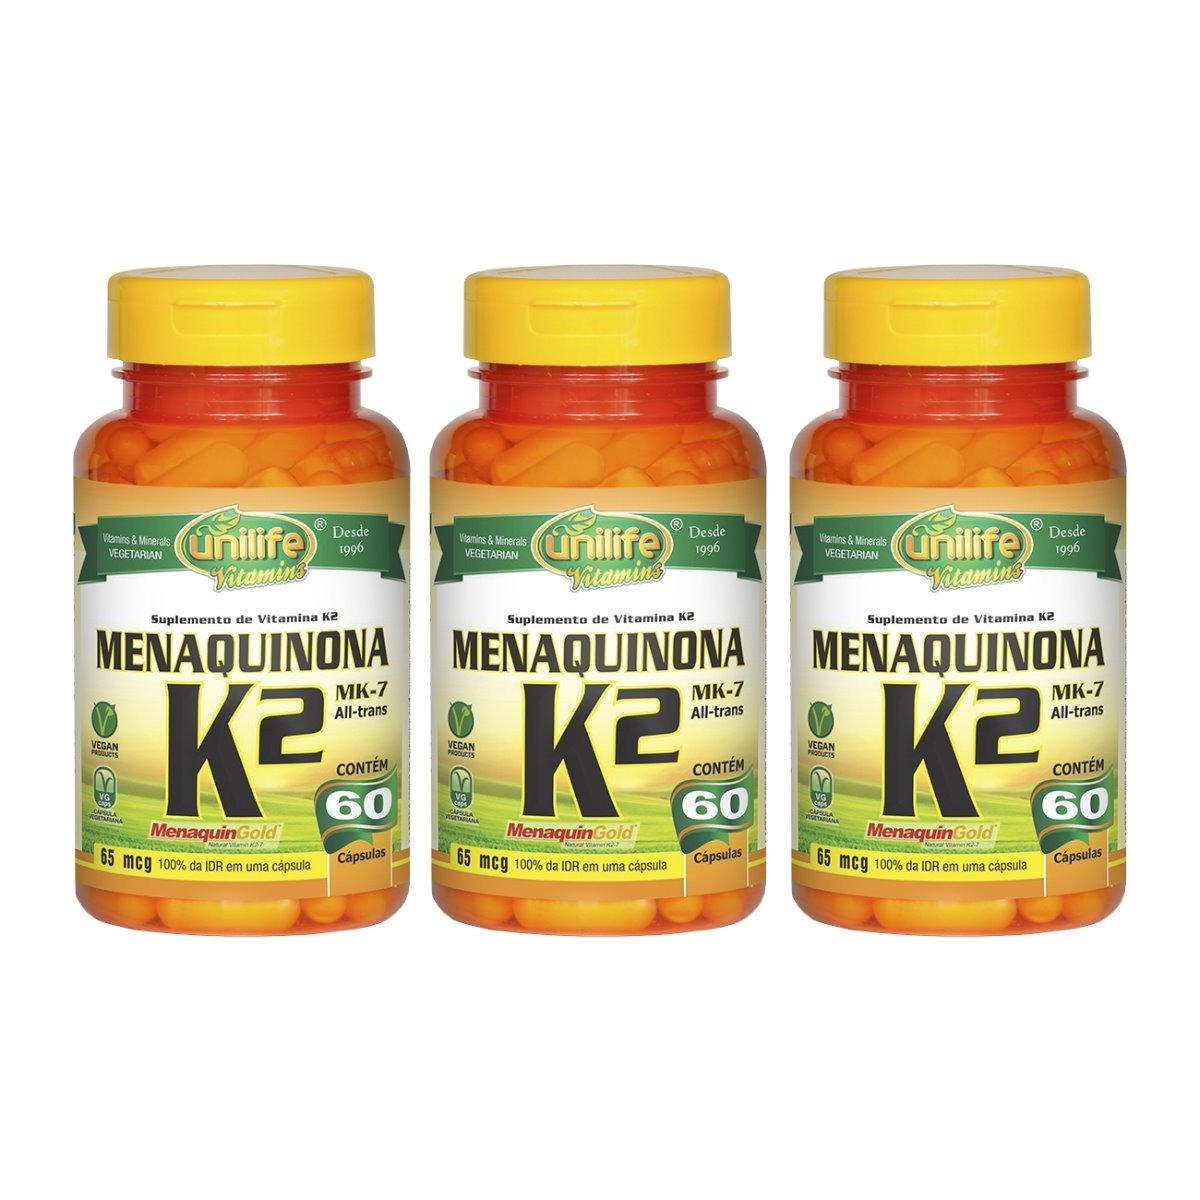 Vitamina K2 Menaquinona MK-7 60 Cápsulas Unilife Kit 3 Unidades